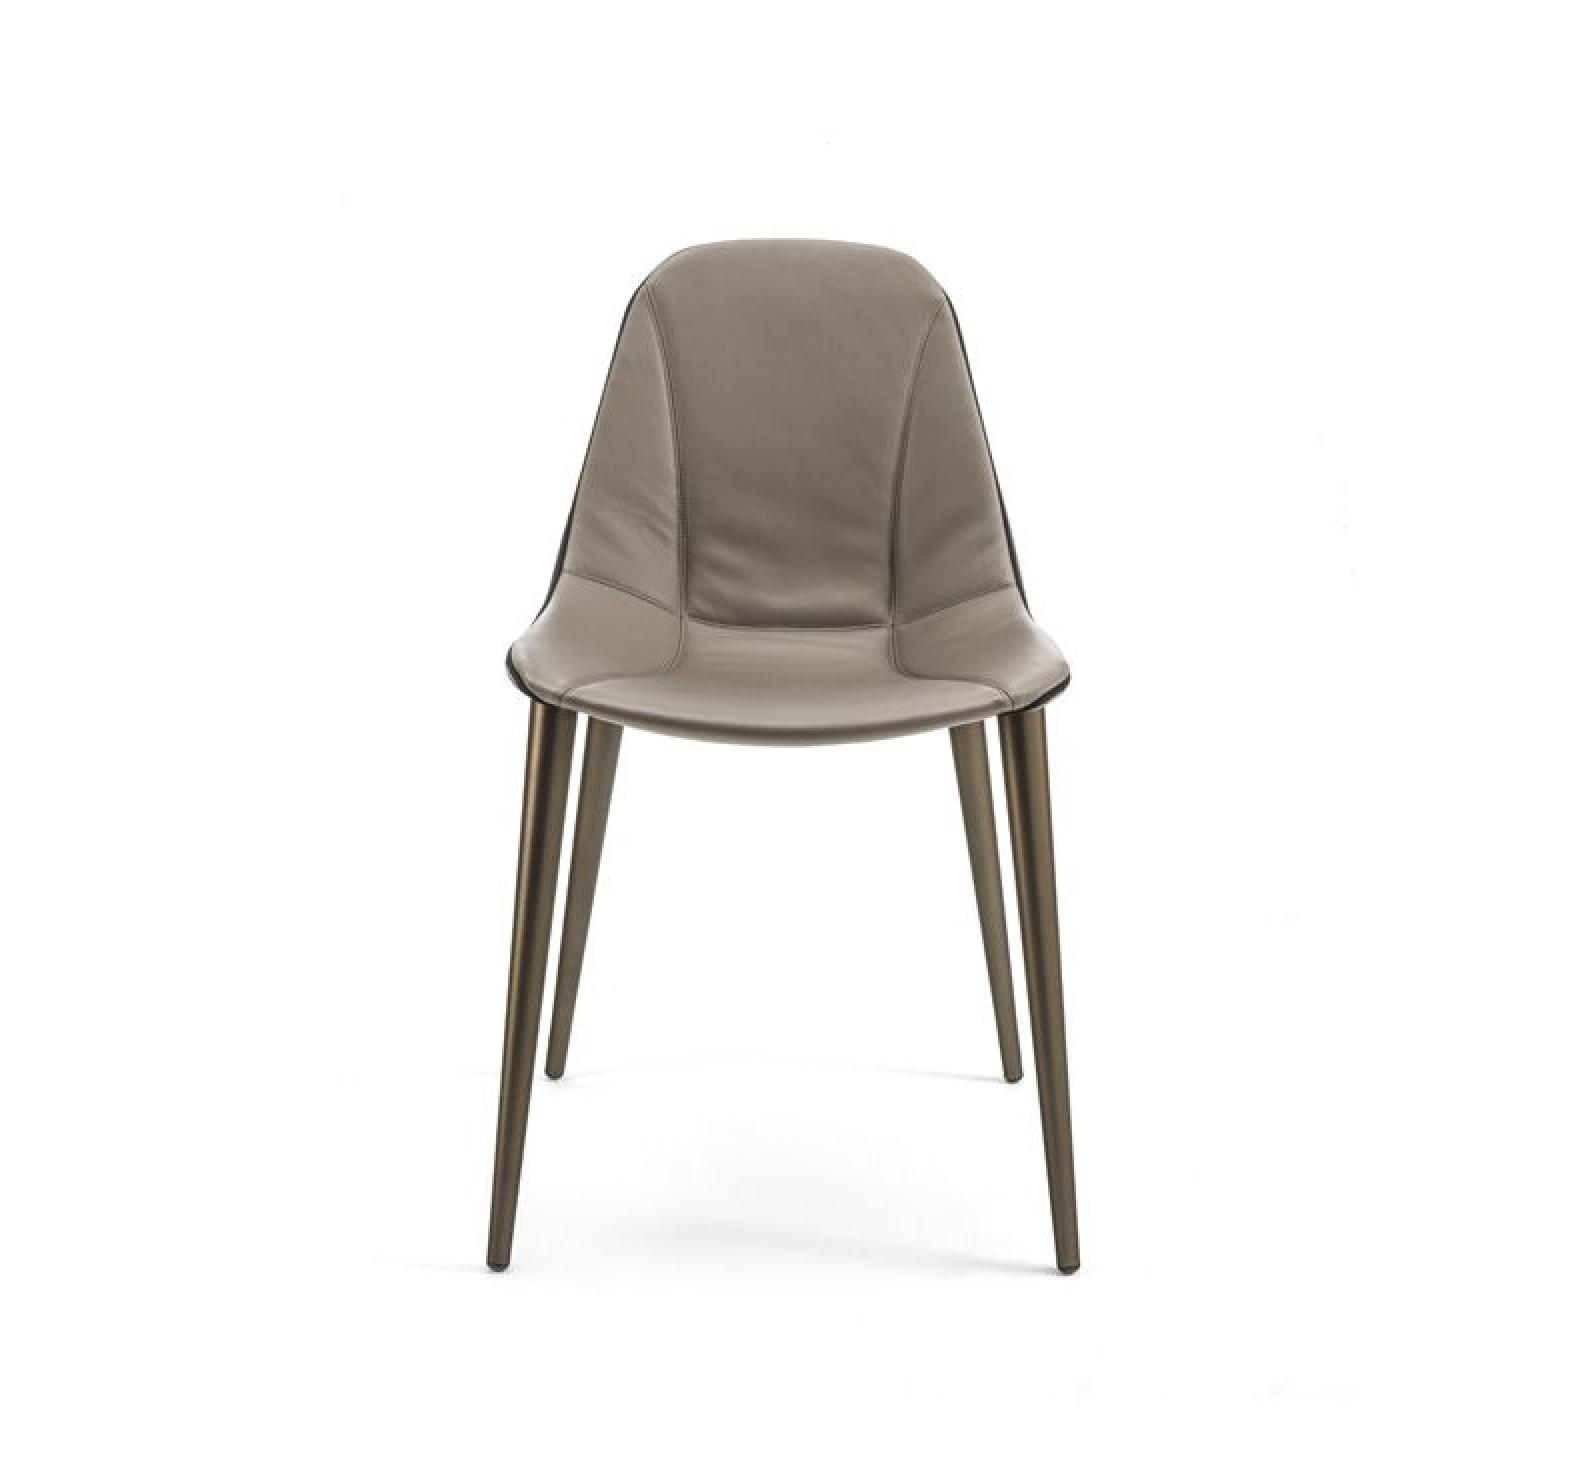 MDC 120 Modern Italian Dining Chairs